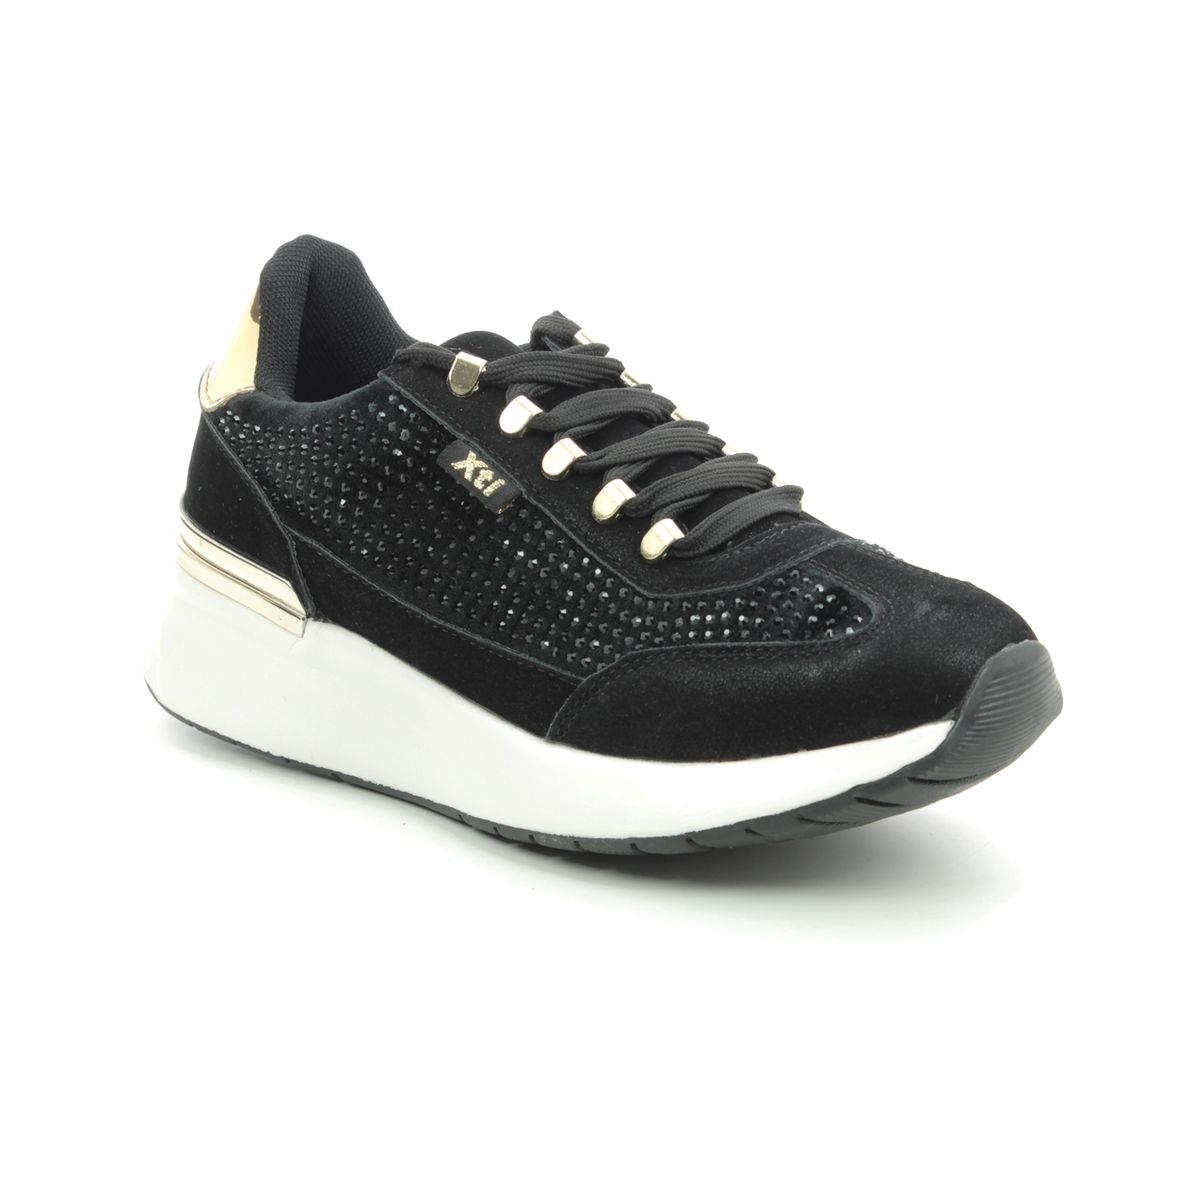 XTI Susie 049506-01 Black trainers